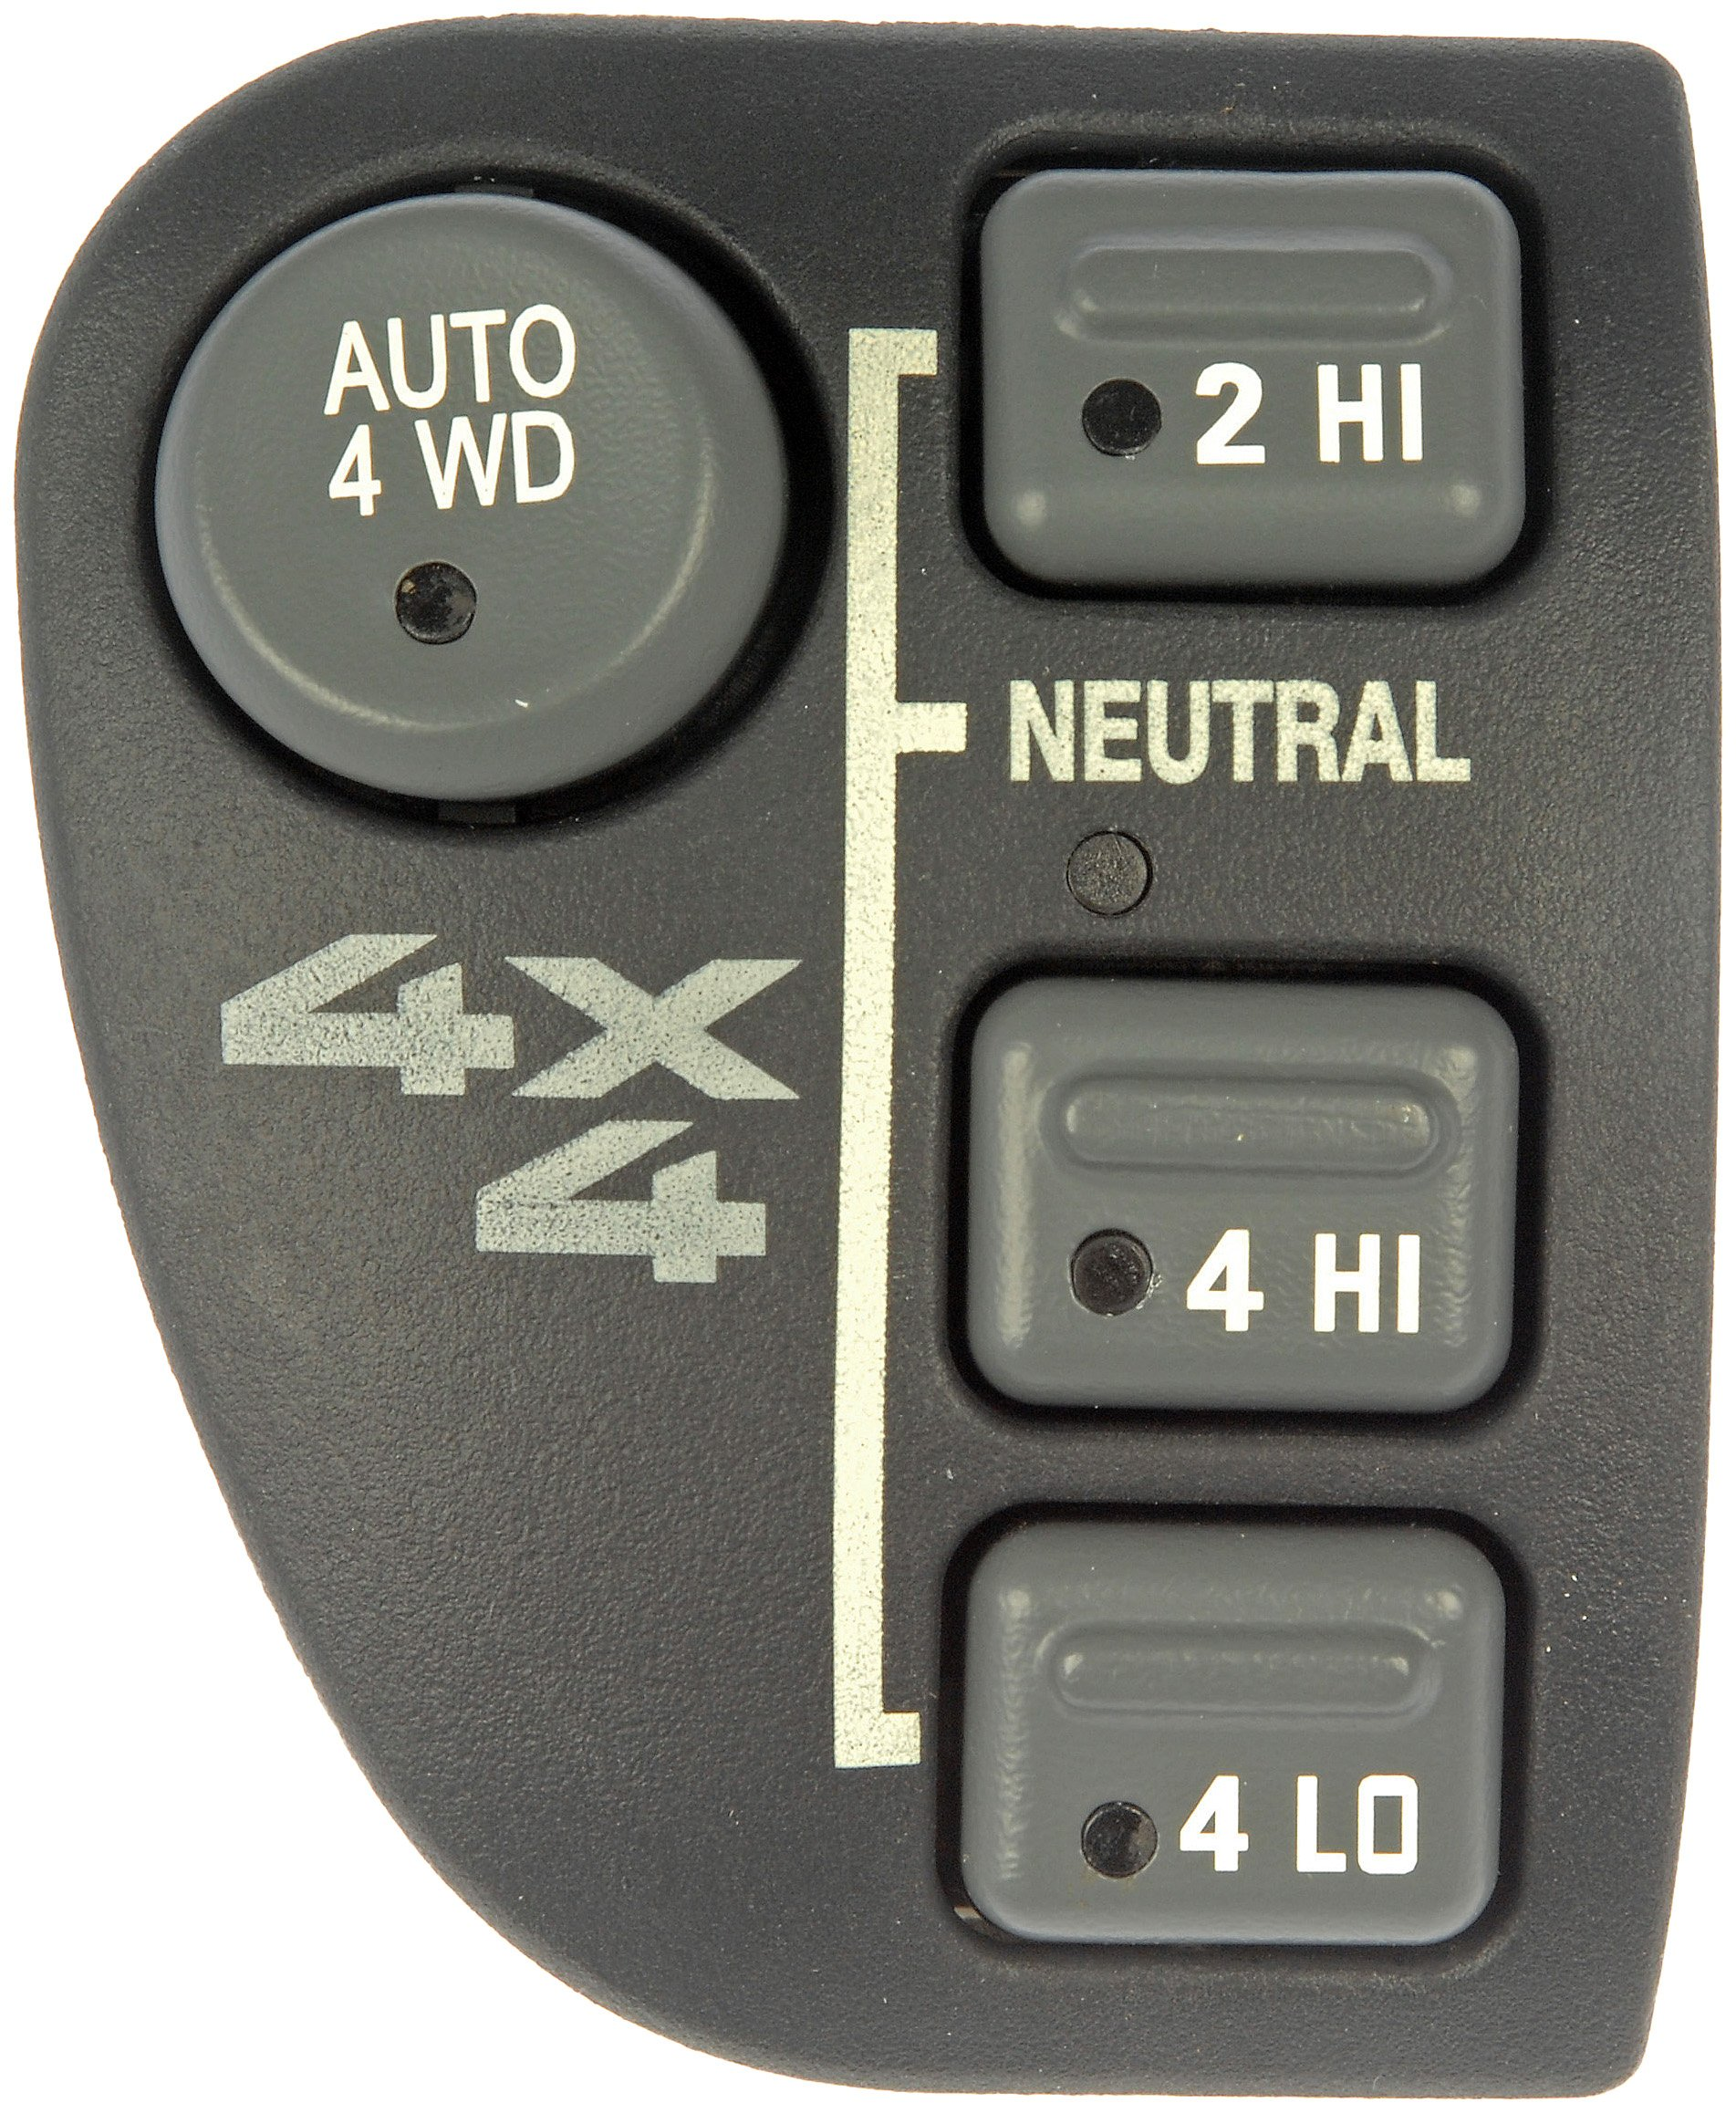 Dorman 901-060 Chevrolet/GMC/Oldsmobile 4WD Switch